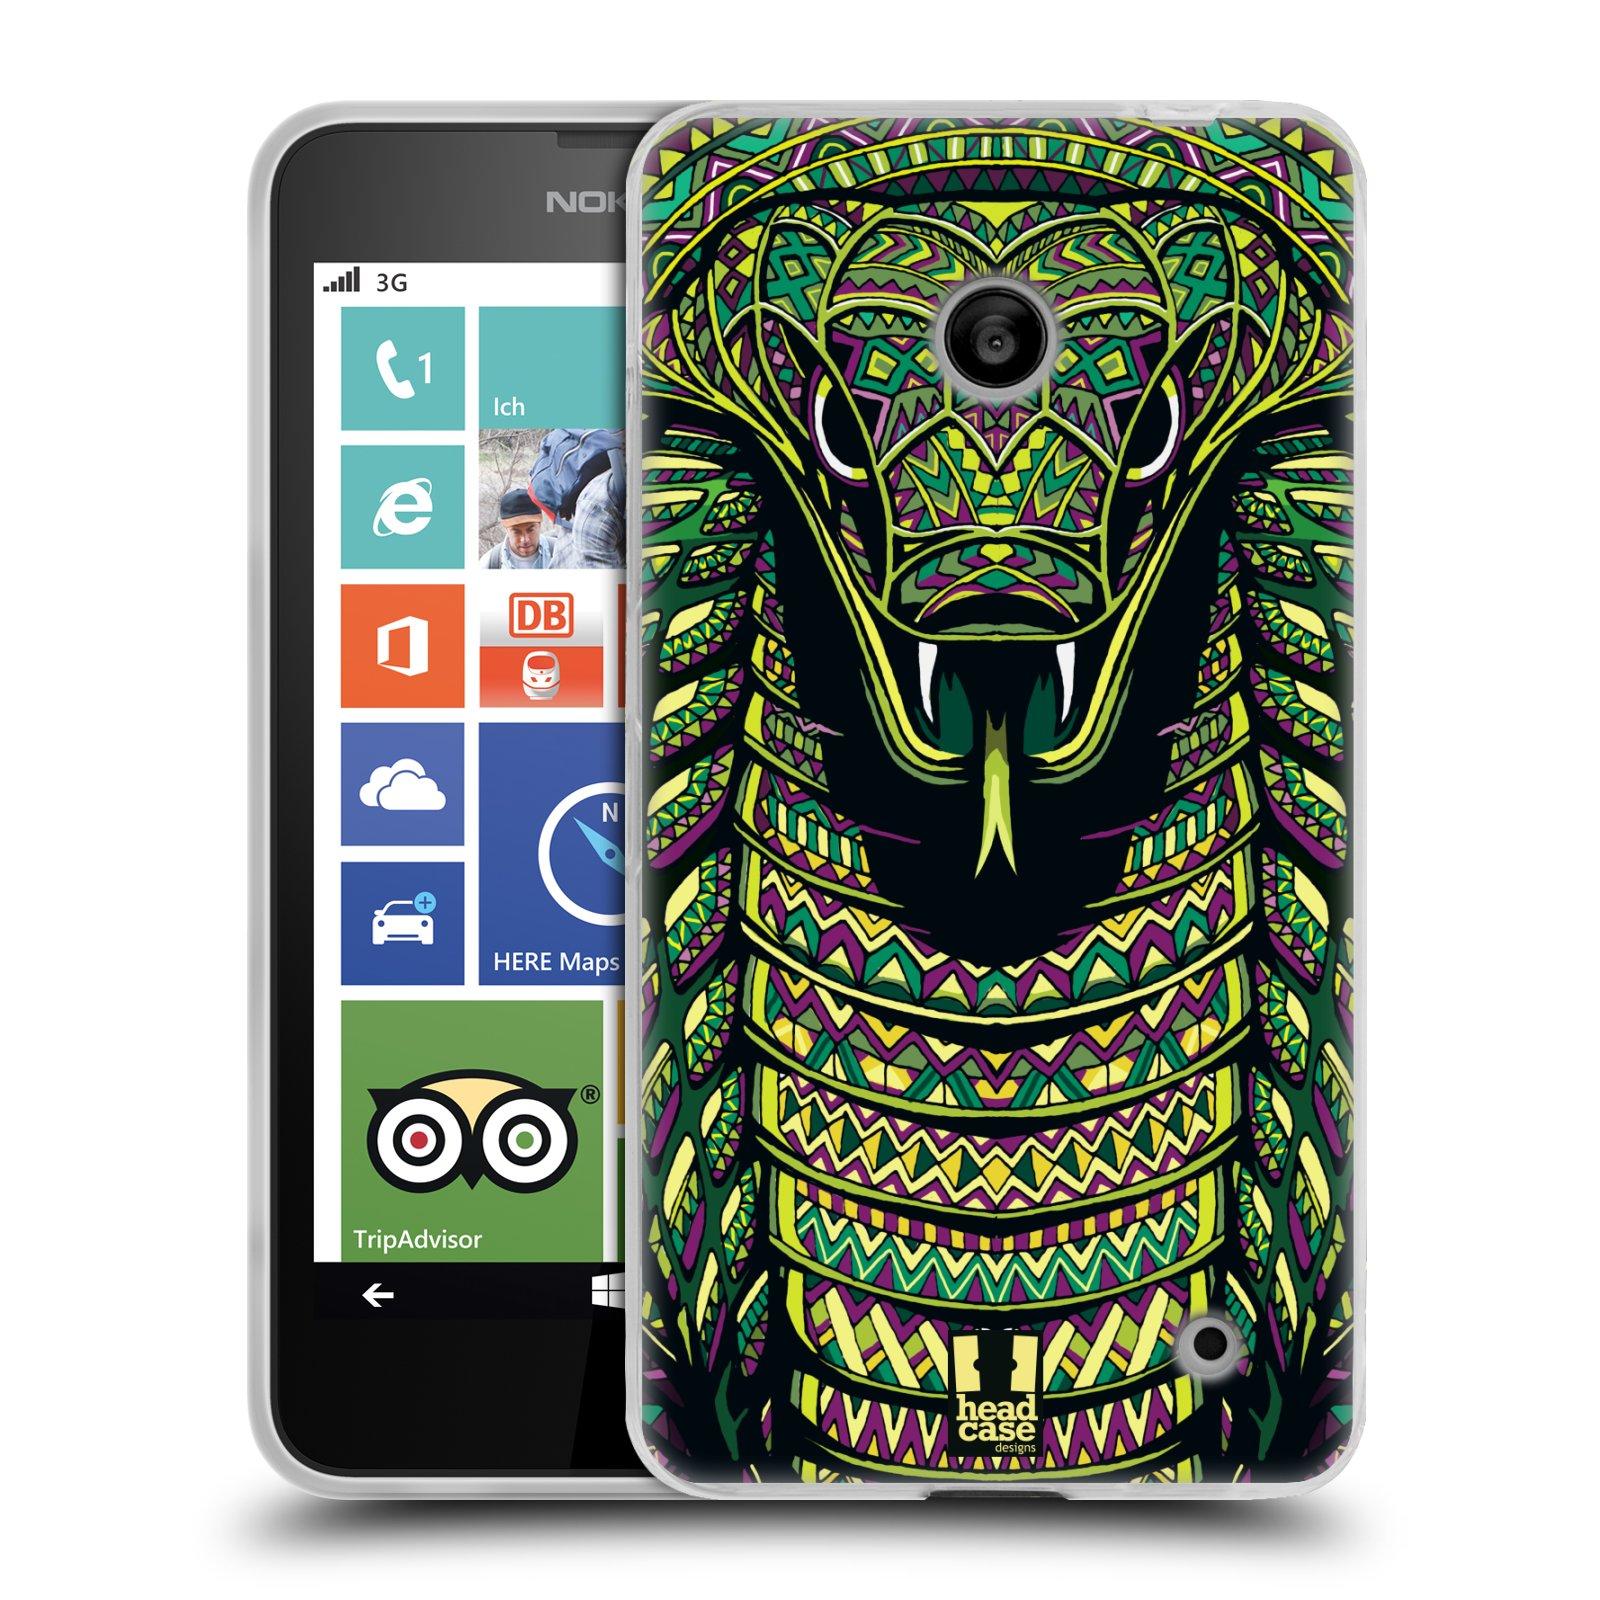 Silikonové pouzdro na mobil Nokia Lumia 630 HEAD CASE AZTEC HAD (Silikonový kryt či obal na mobilní telefon Nokia Lumia 630 a Nokia Lumia 630 Dual SIM)